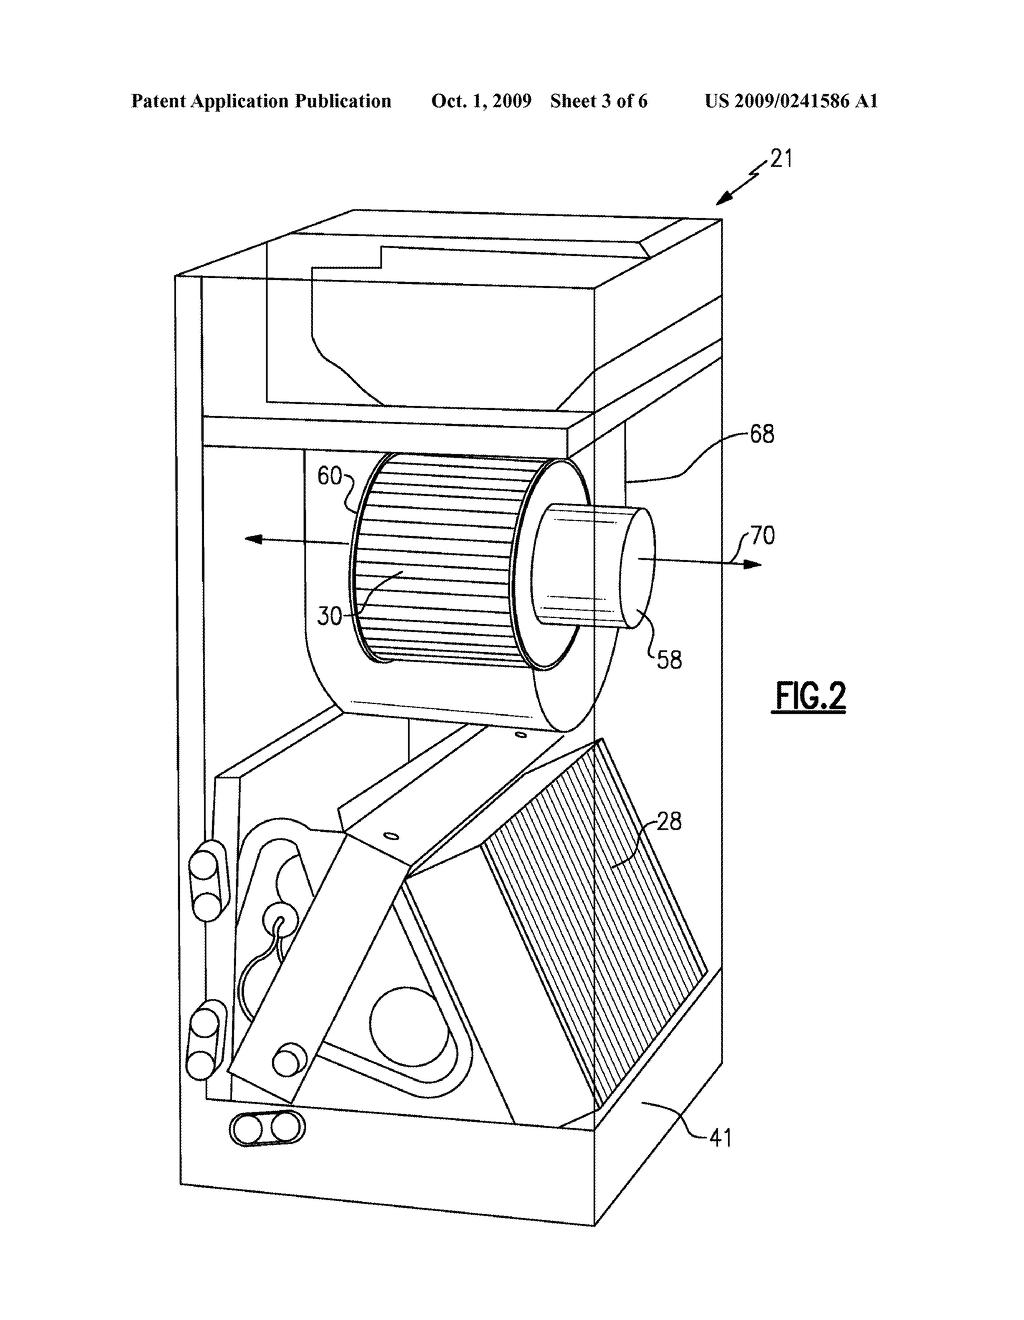 fan coil unit wiring diagram dodge ram 1500 fuse box harley fxr ignition imageresizertool com